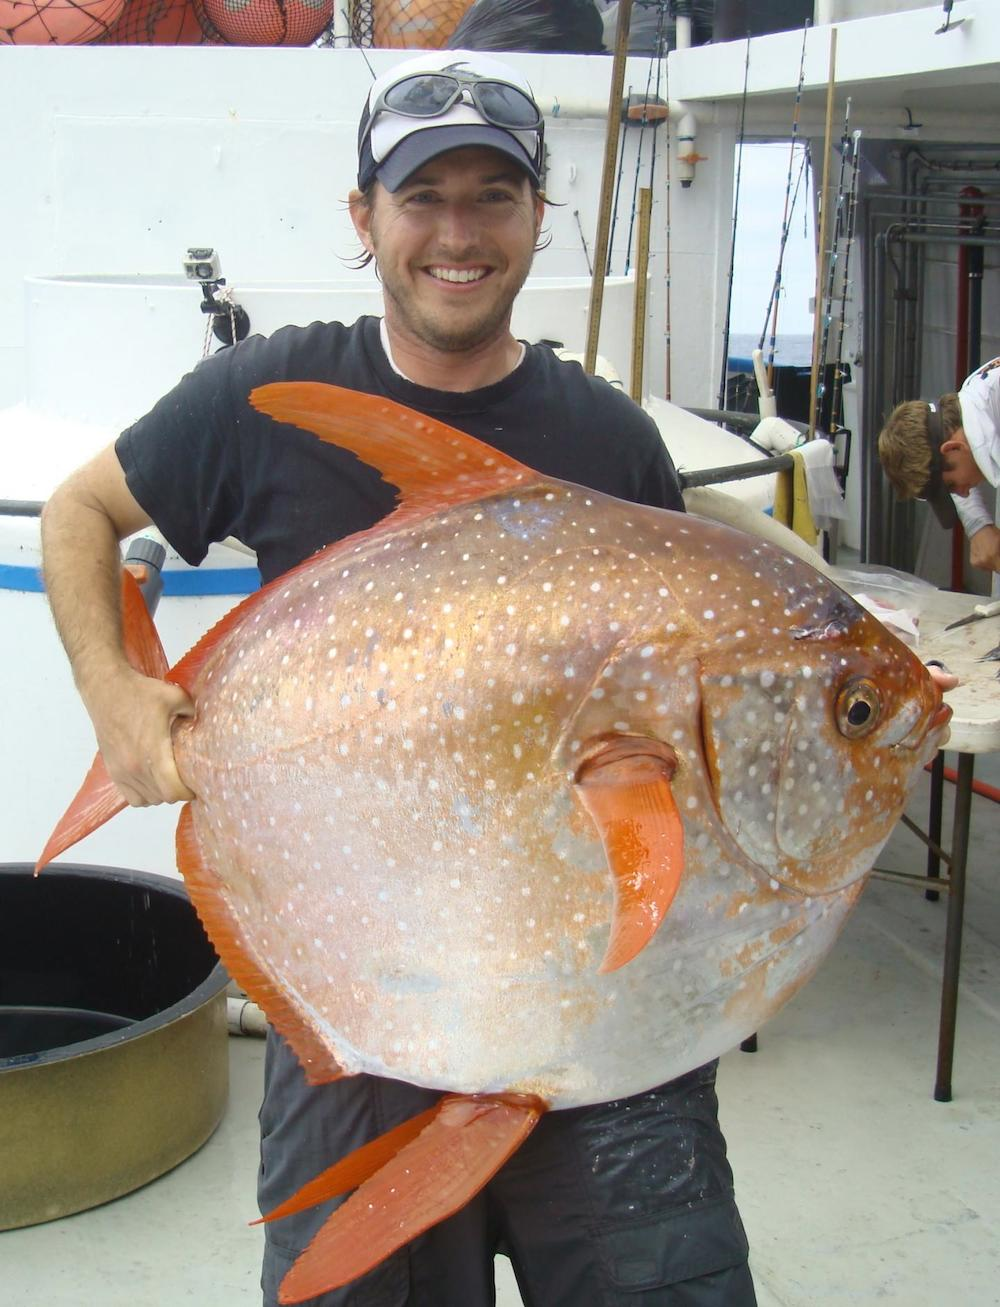 Nick Wegner a segurar um peixe-cravo. Fotografia: NOAA Fisheries/Southwest Fisheries Science Center